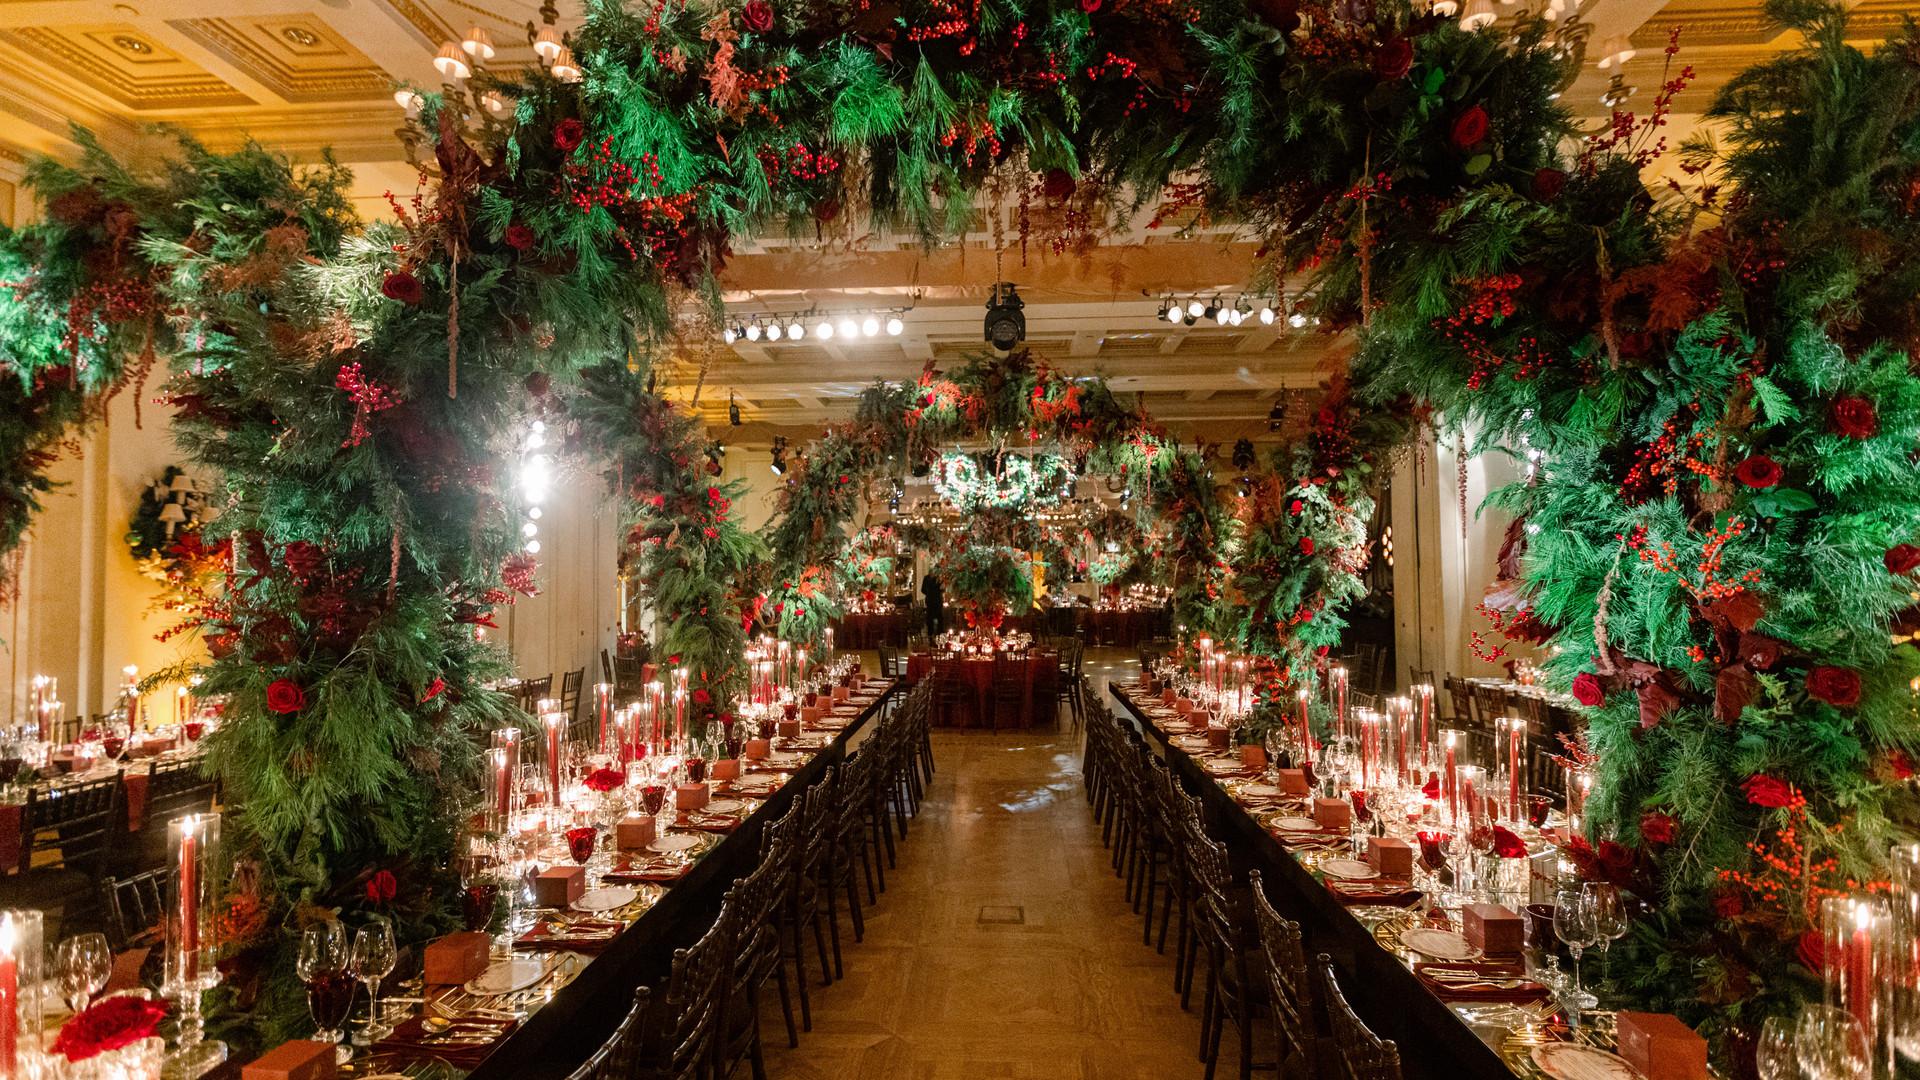 Christmas forest decoration.JPG